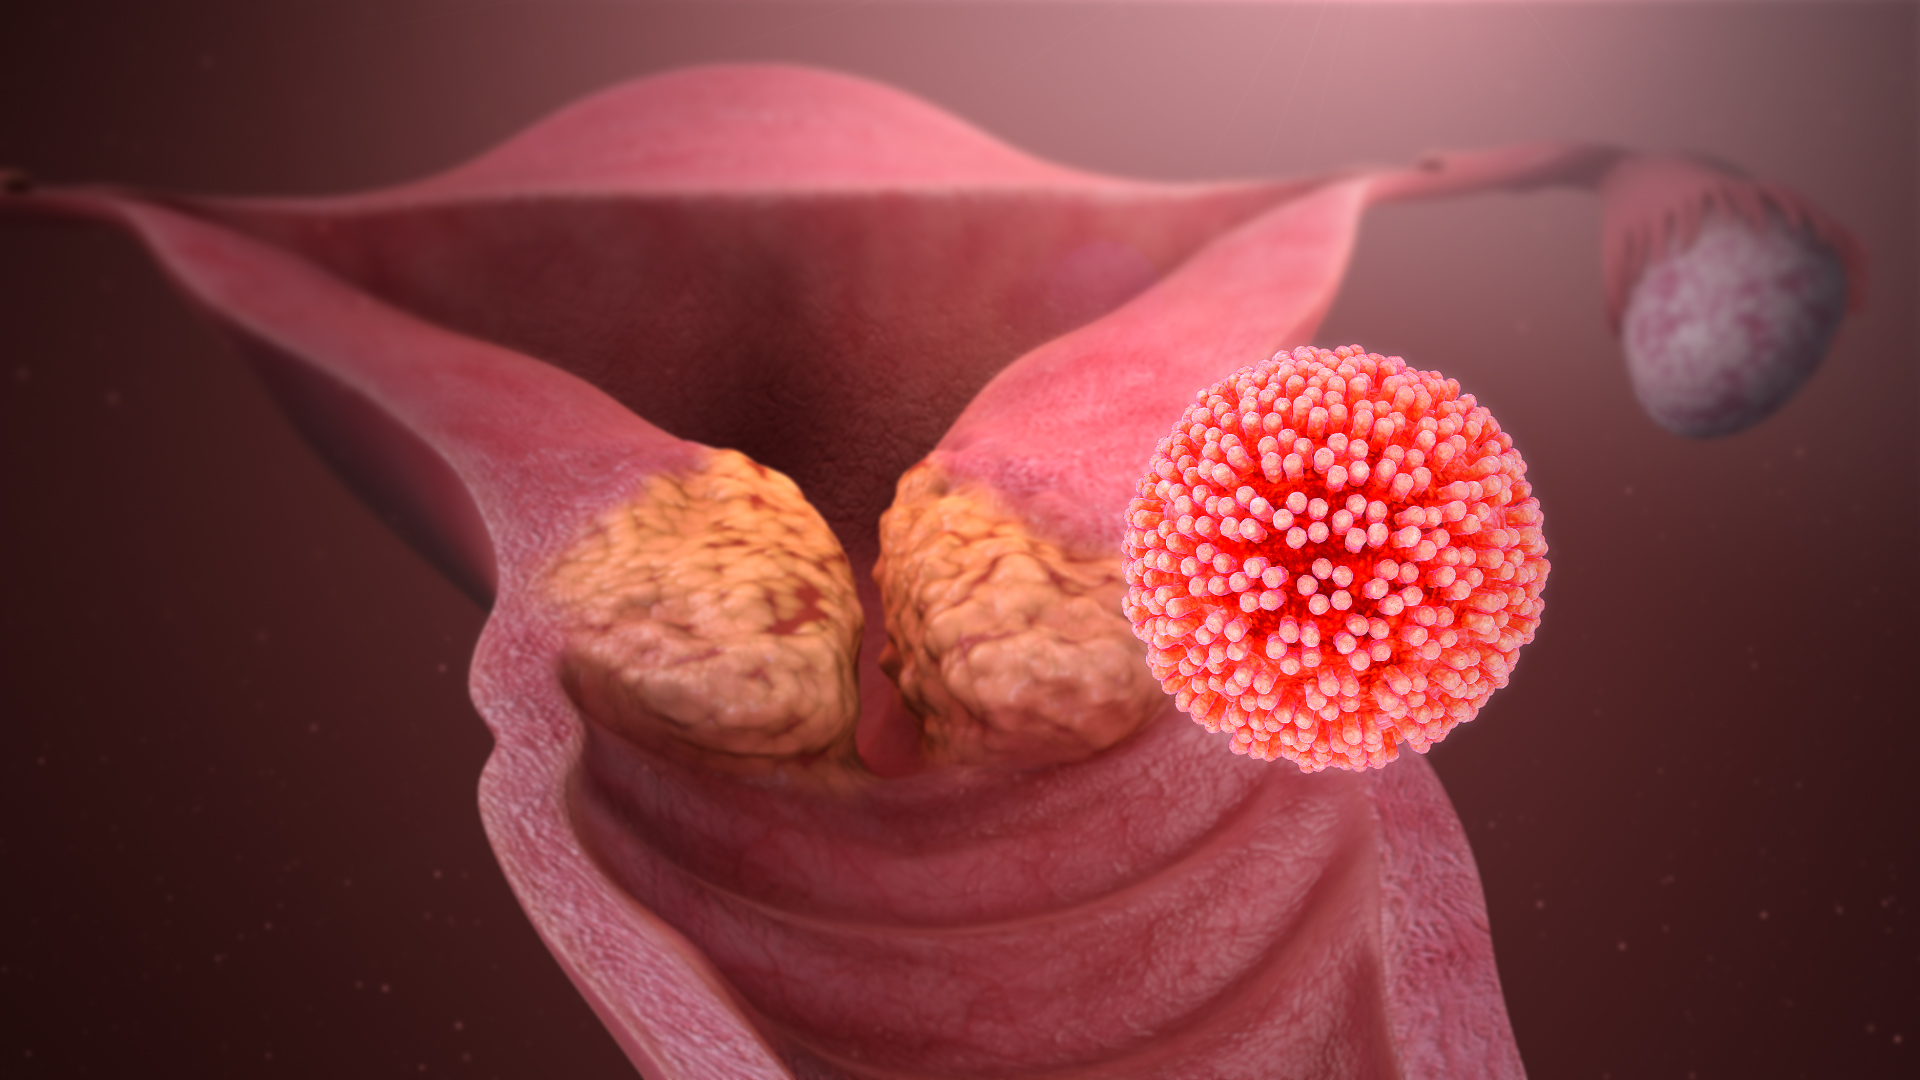 hpv humanes papilloma virus)